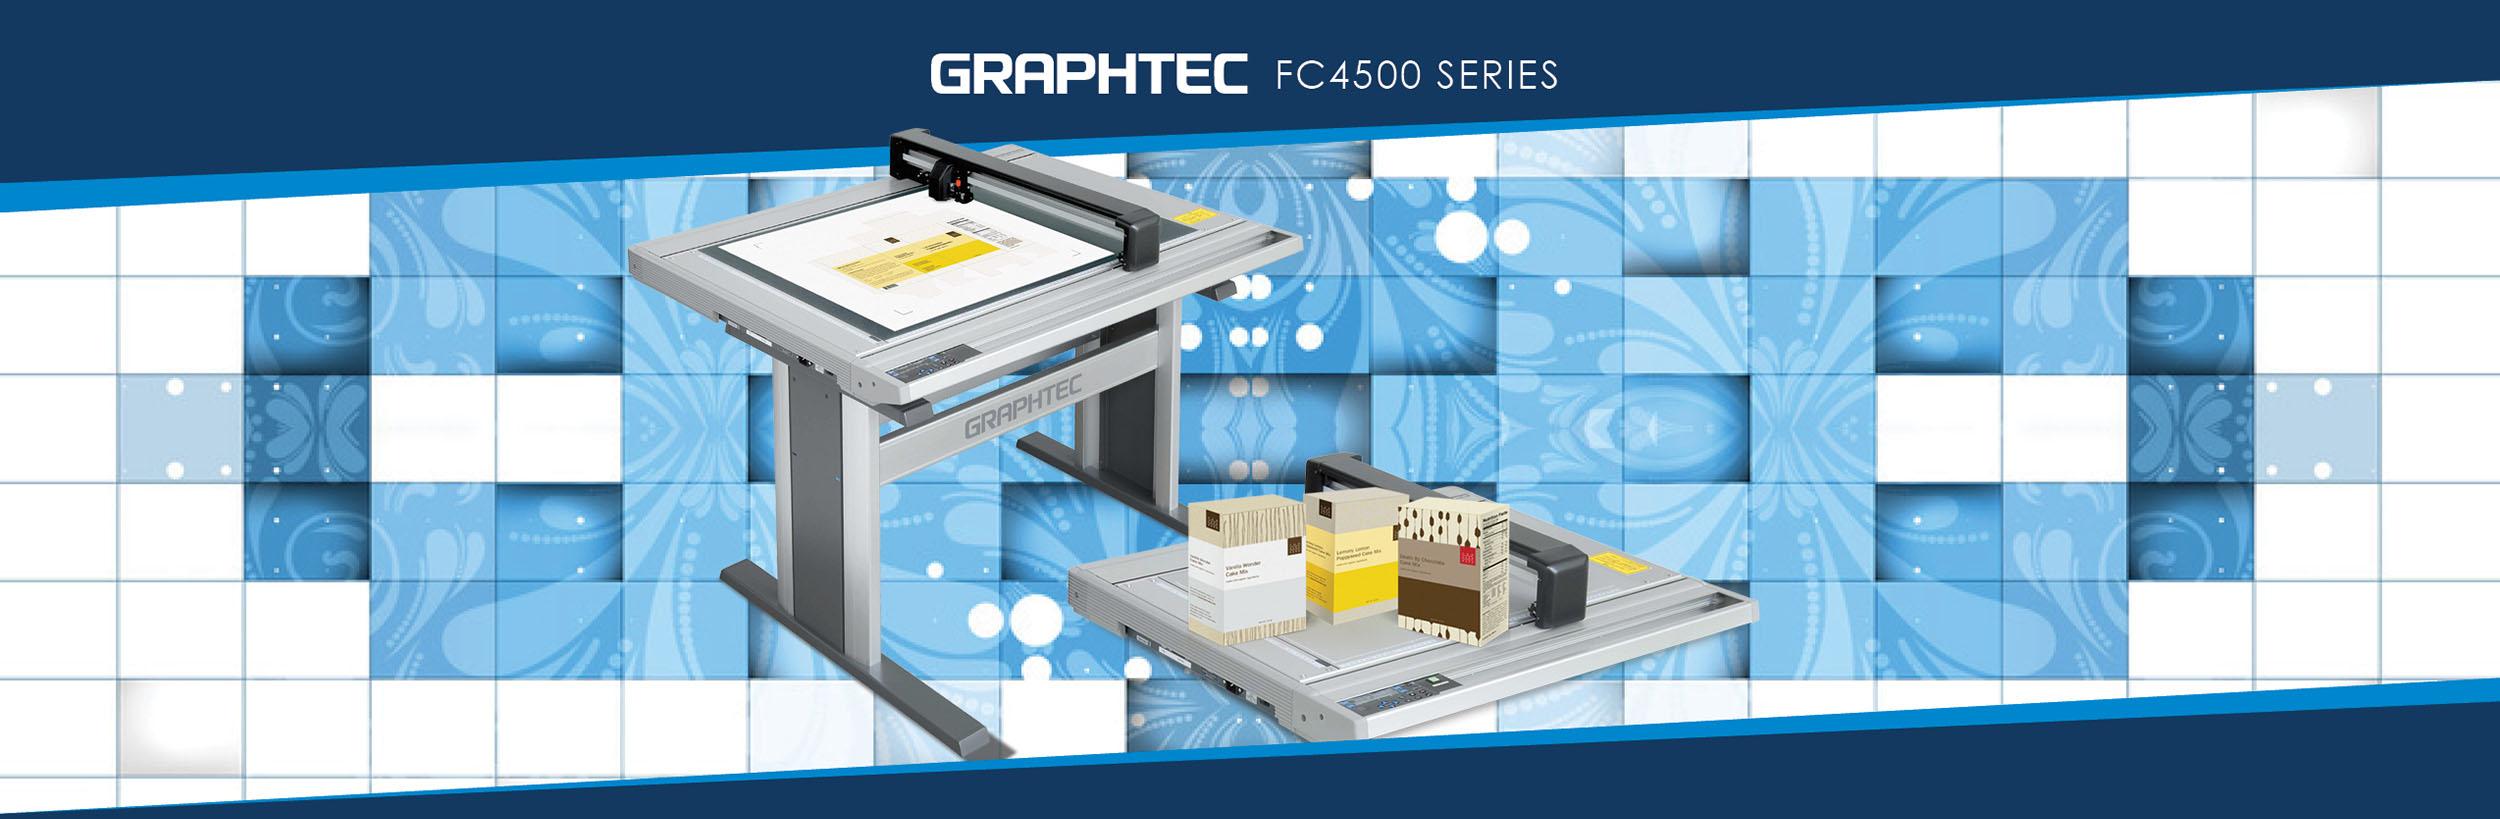 Vinyl+Cutter+Flatbed Cutter+Package Cutter Machine+Graphtec+FC4500 Series High Quality.jpg